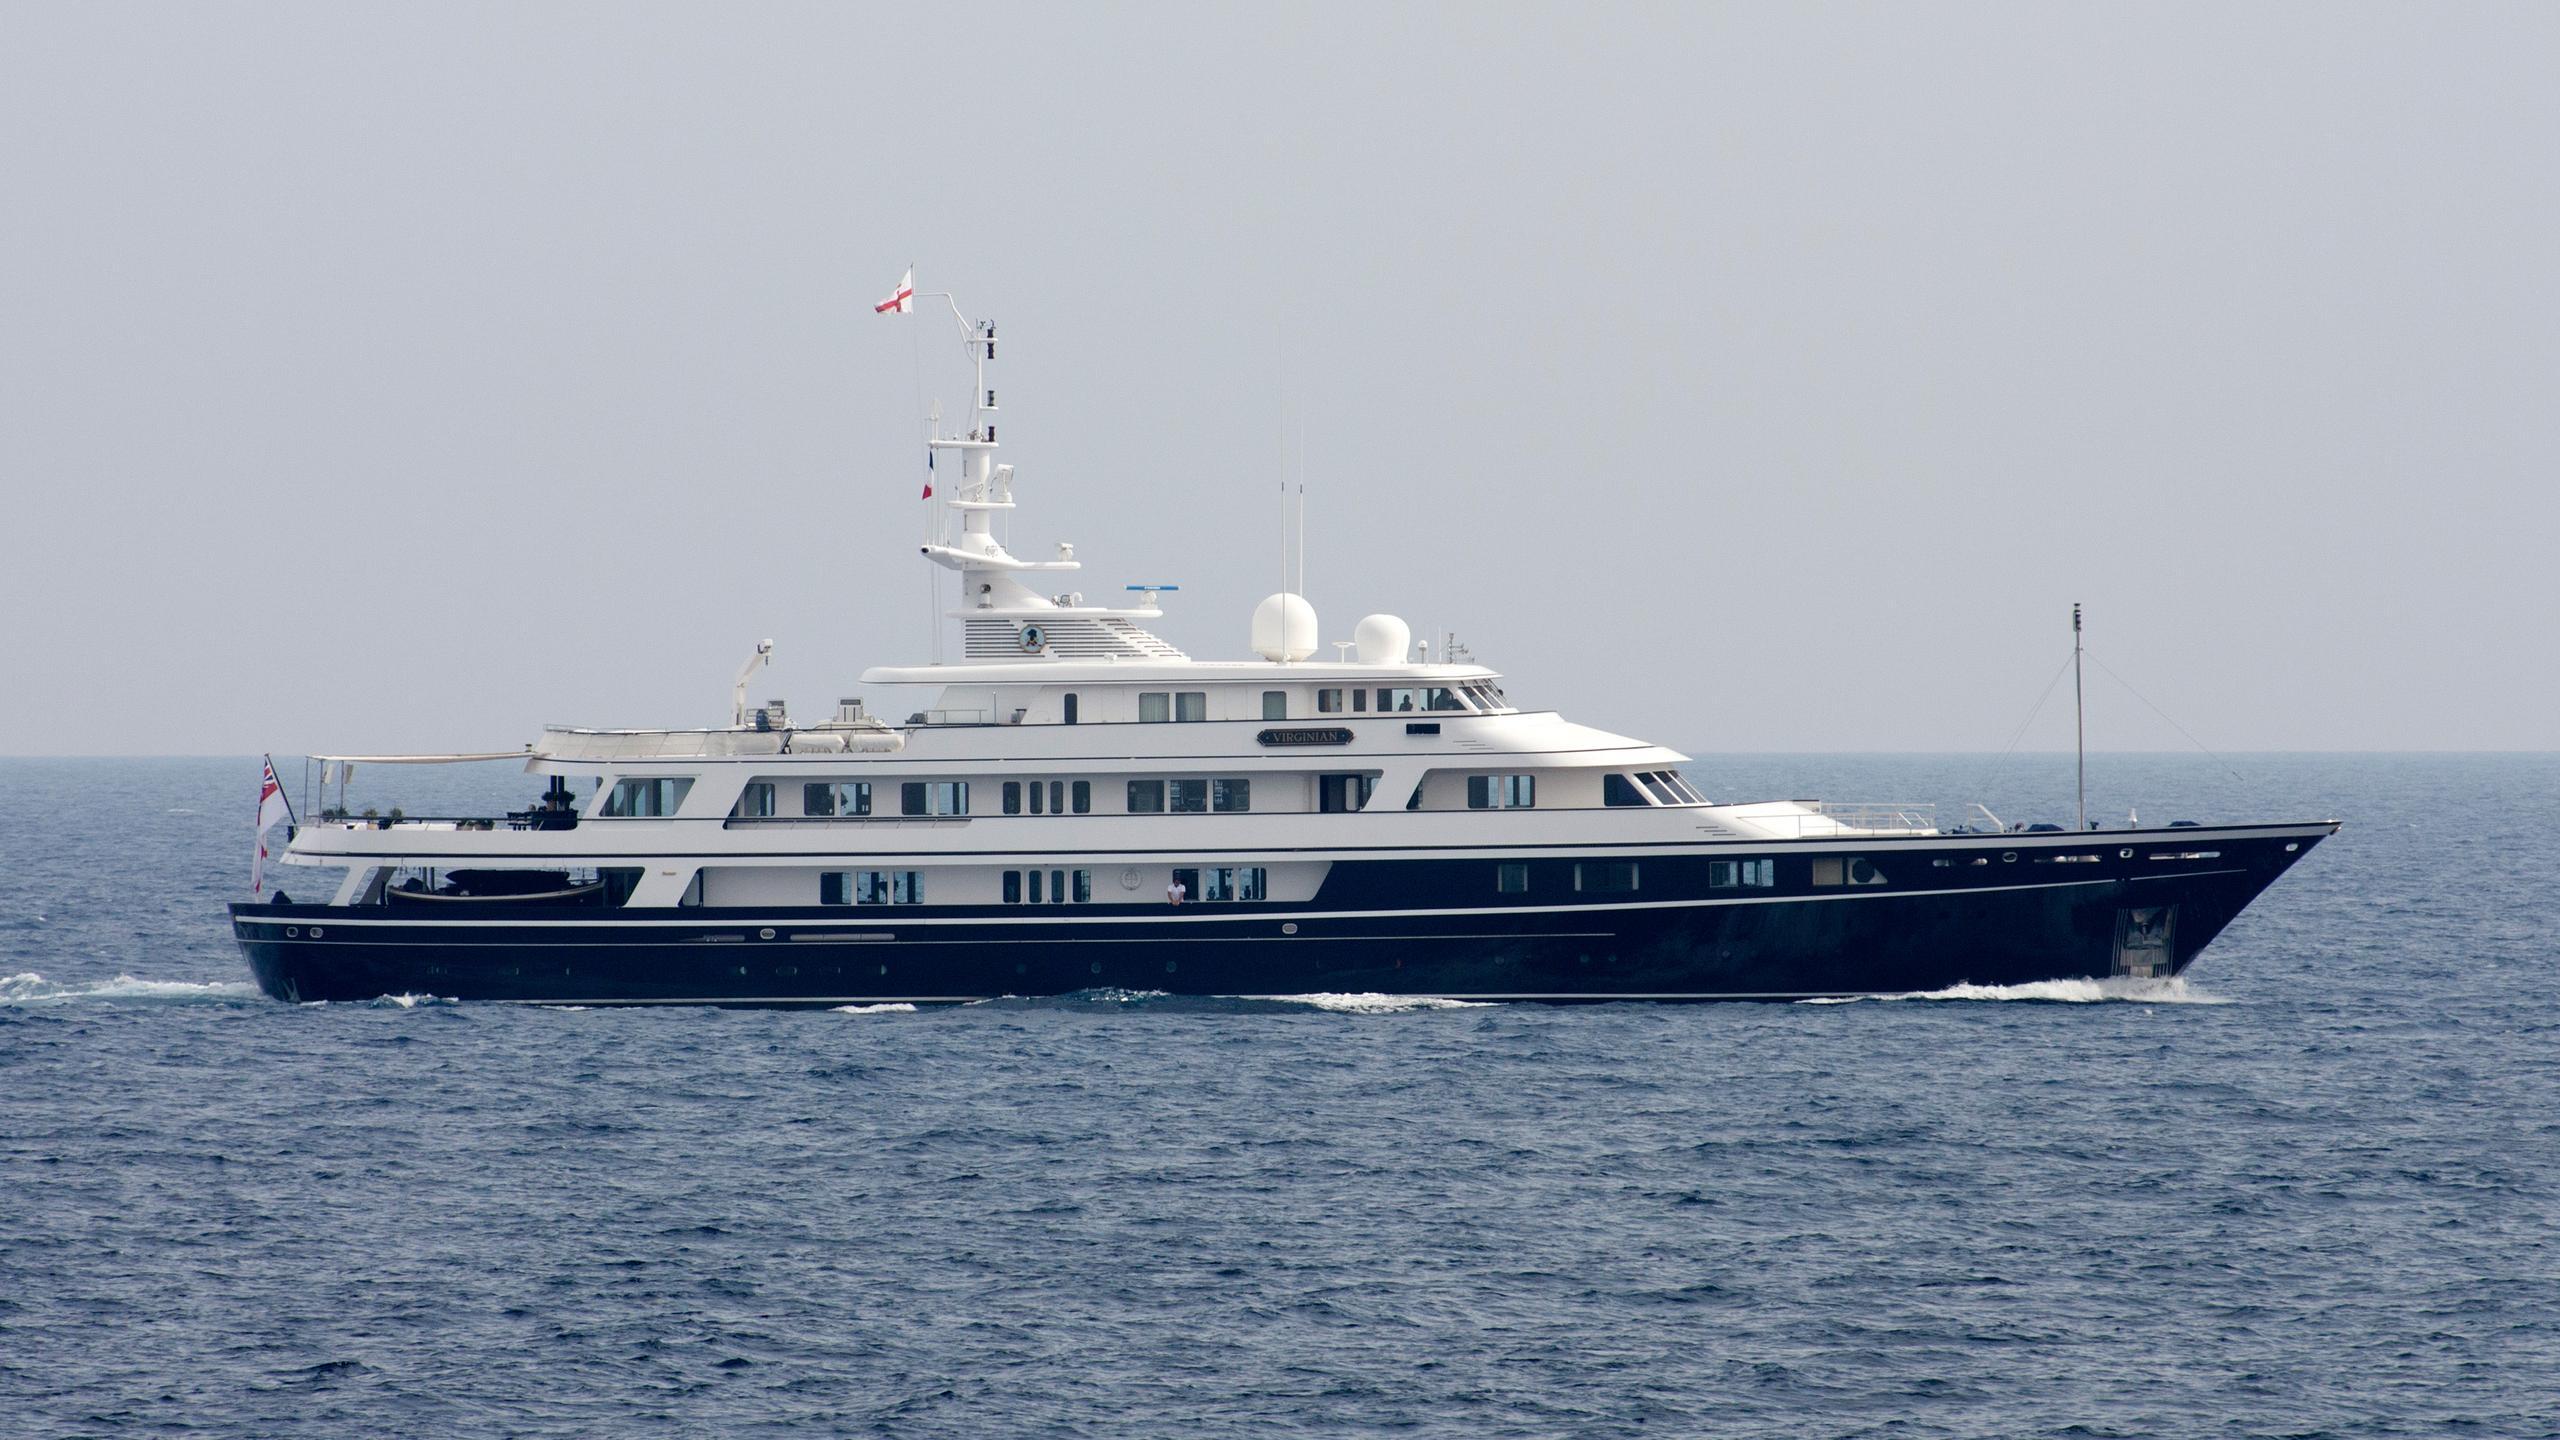 virginian-motor-yacht-feadship-1991-62m-profile